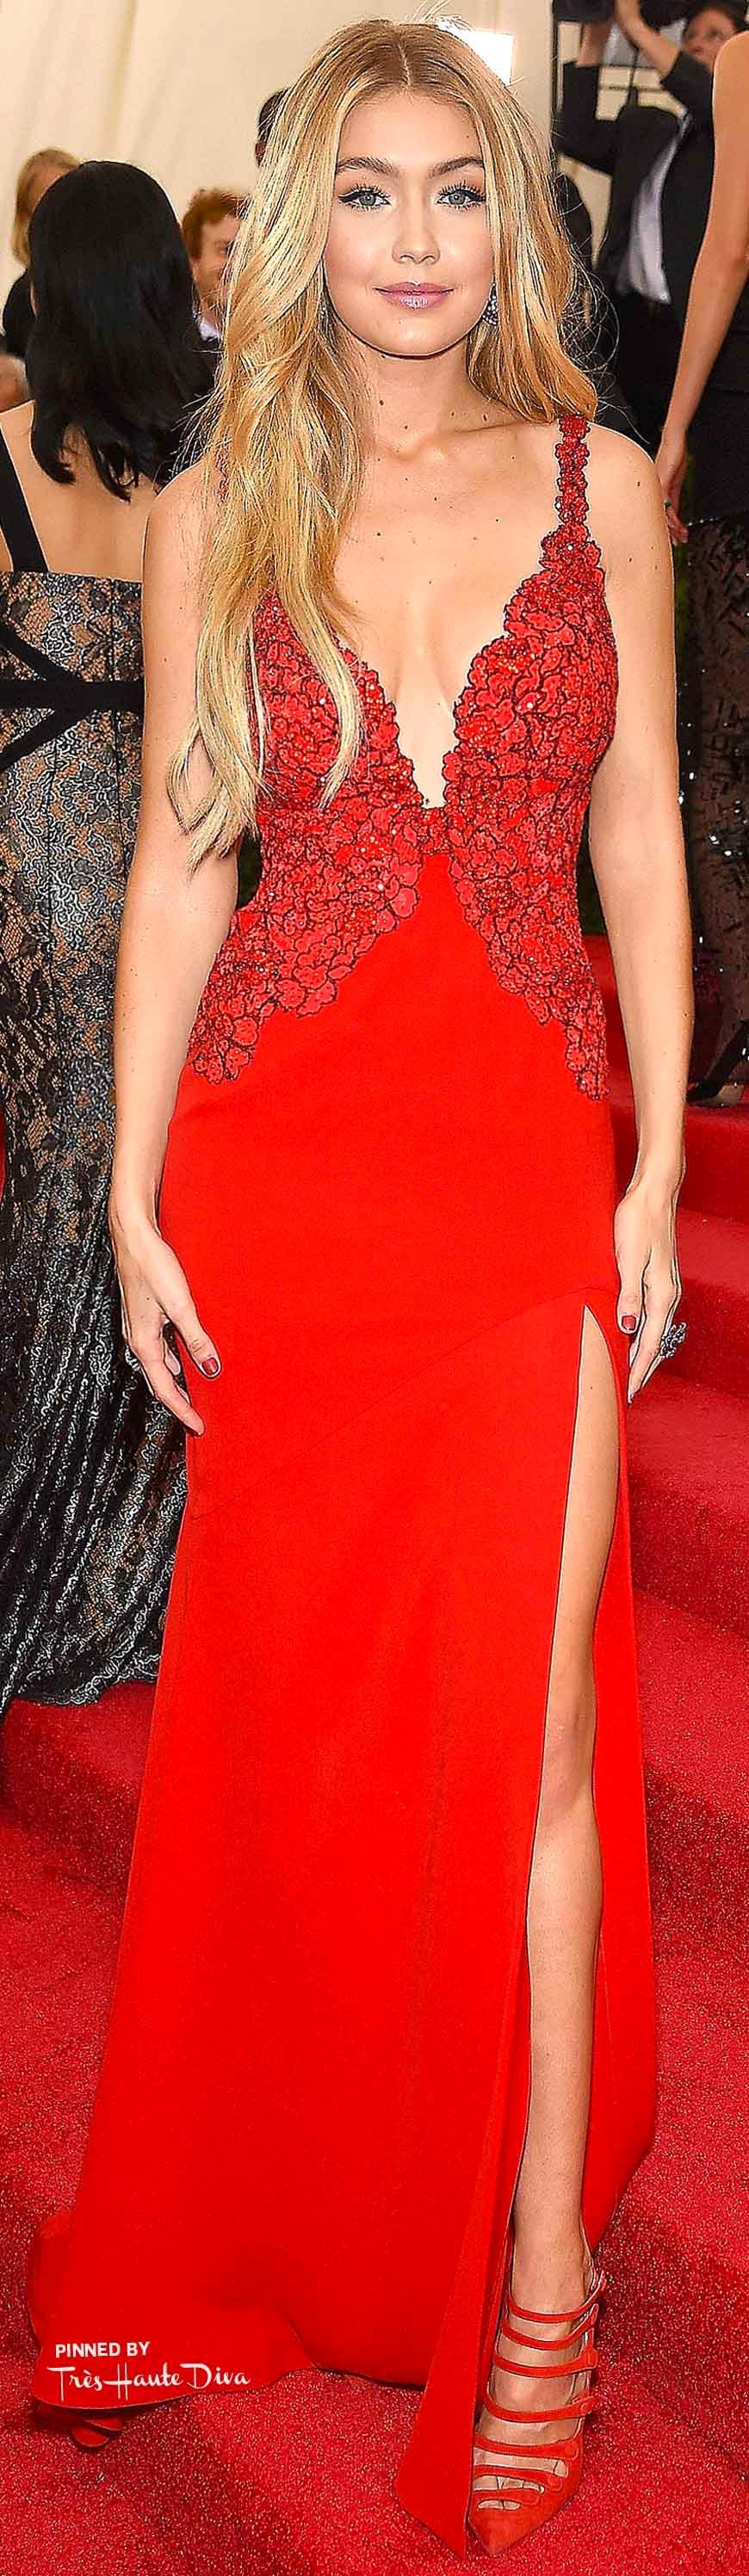 Gigi Hadid in Diane von Furstenberg Getty Images/ Dimitrios Kambouris